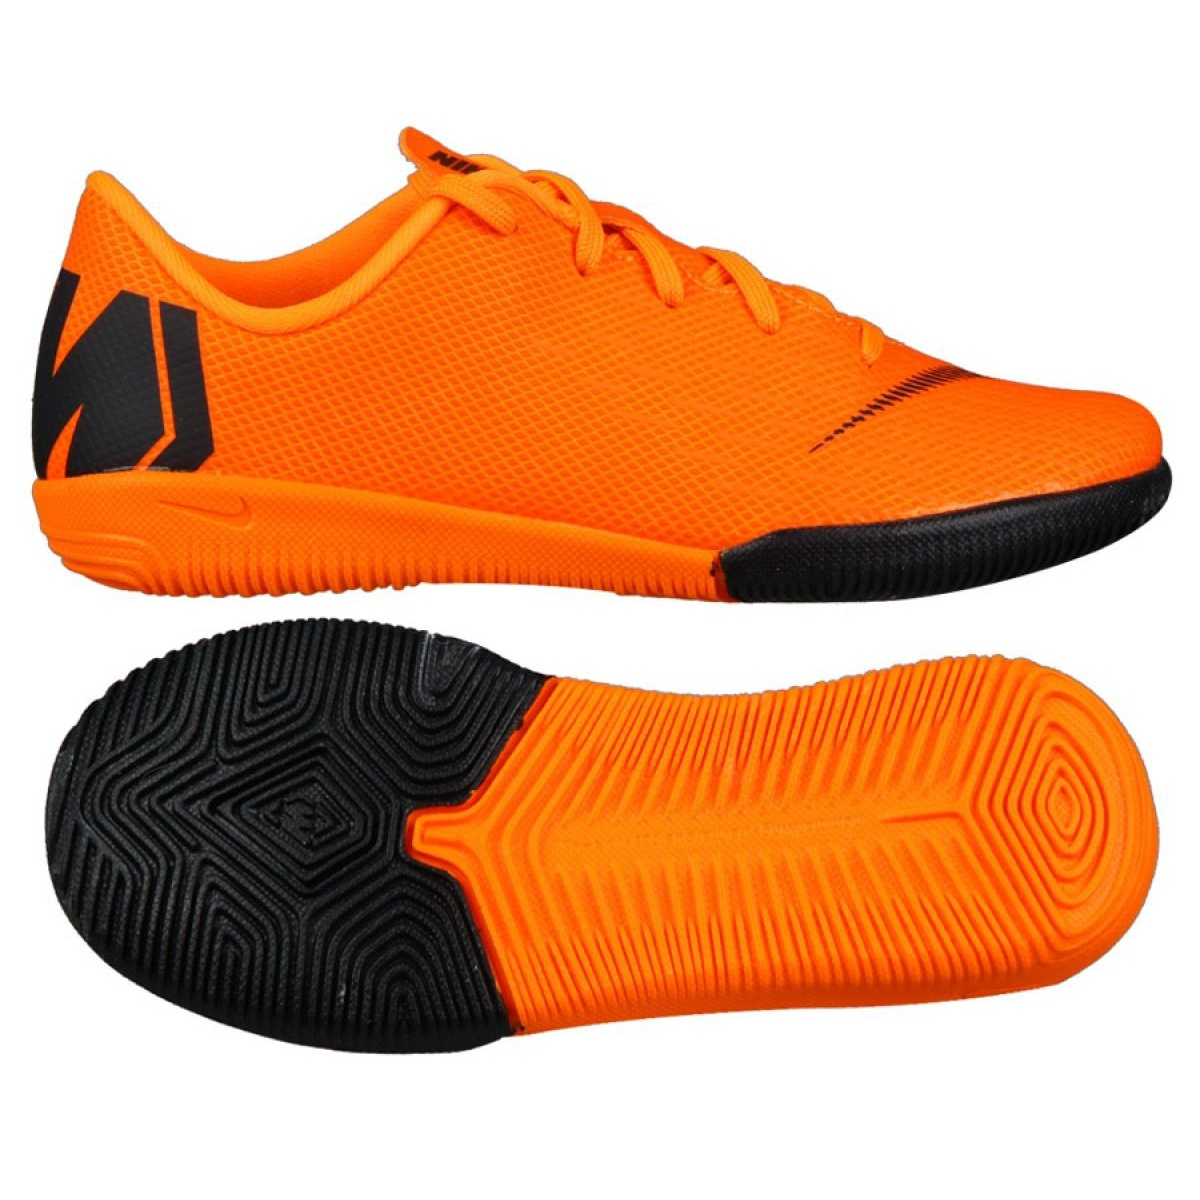 buy popular 5d954 09808 Football shoes Nike Mercurial VaporX 12 Academy Ps Ic Jr AH7352-810